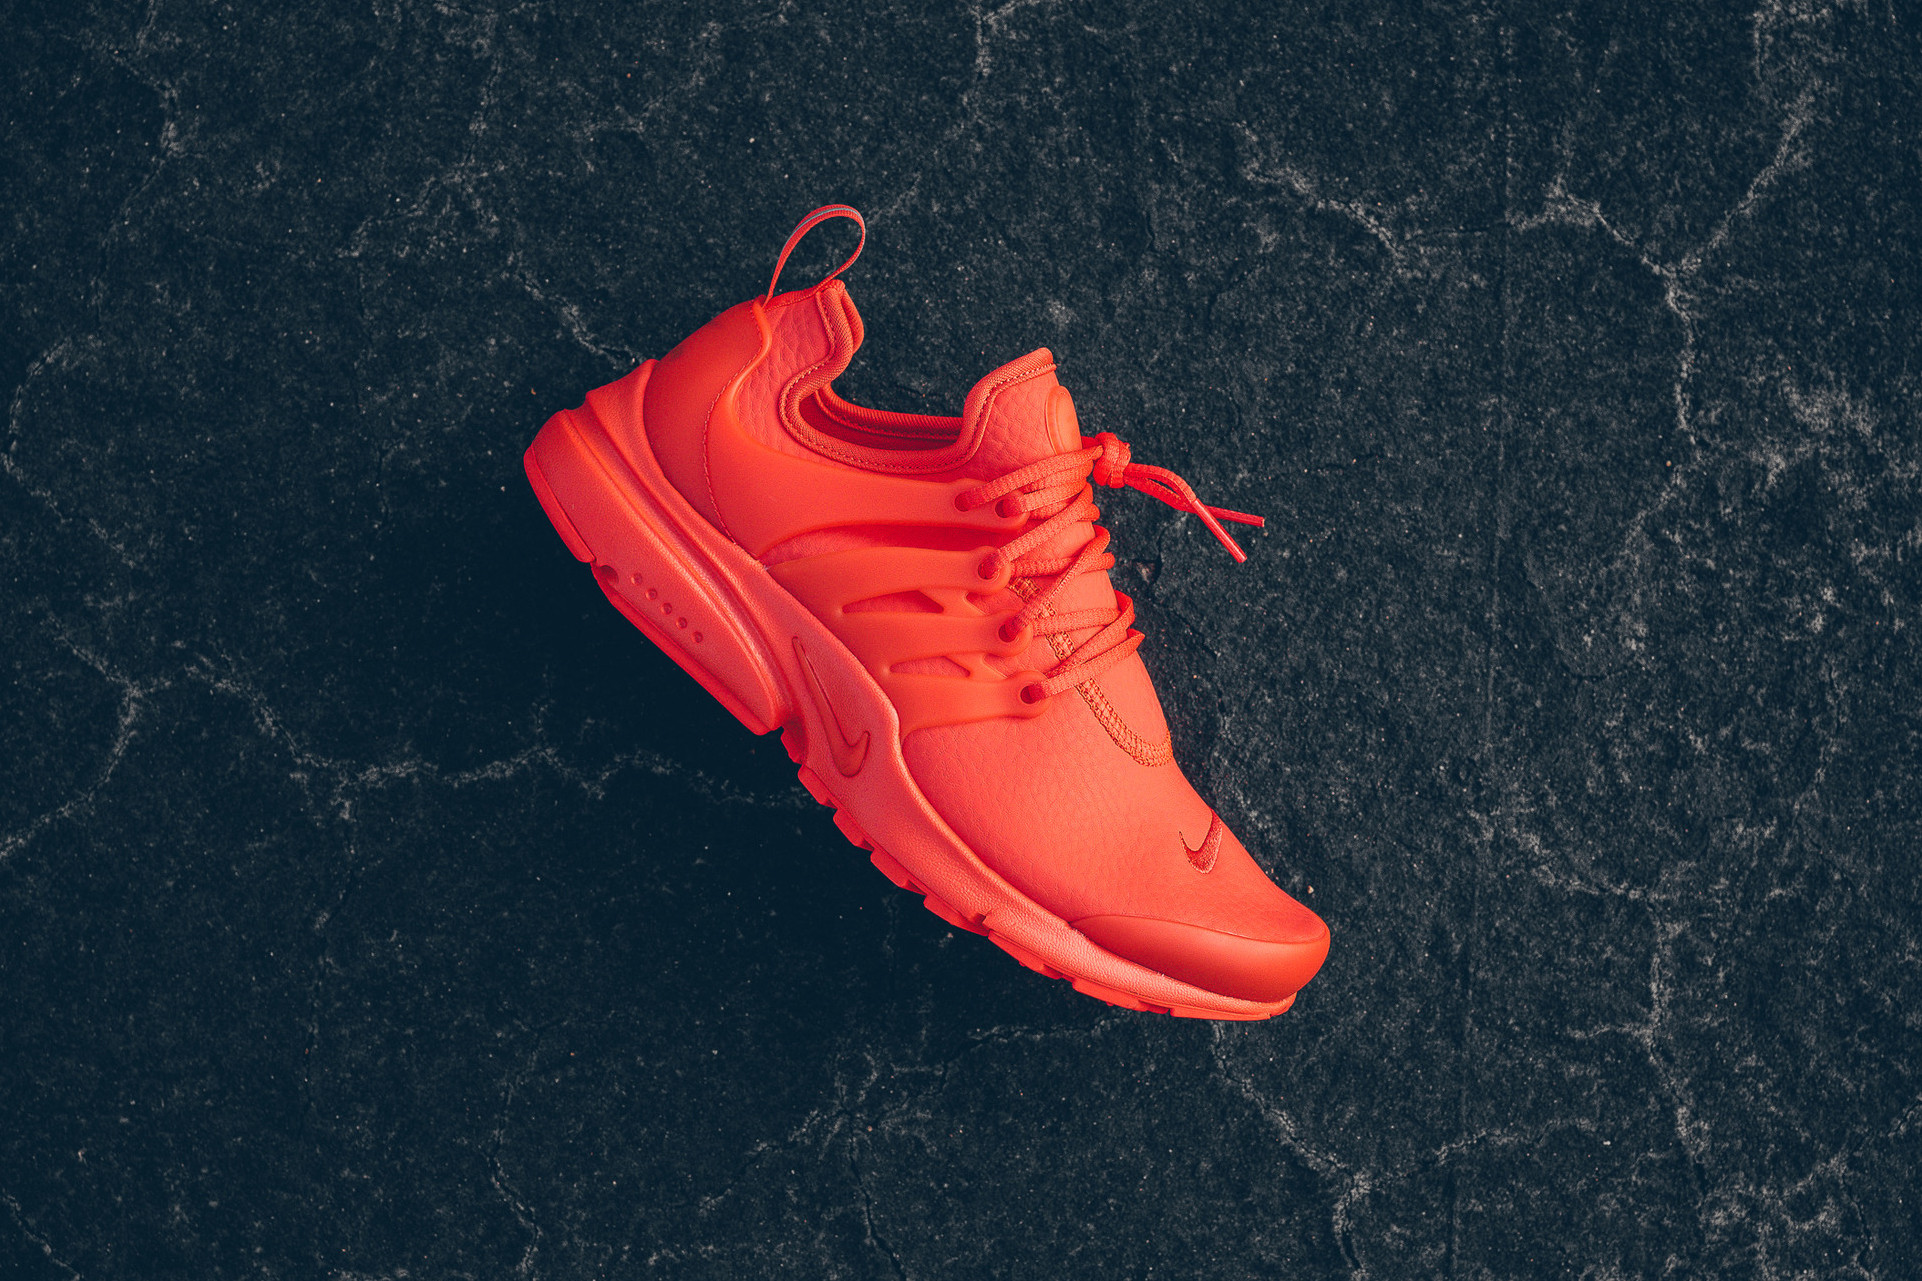 Nike Reveals Blazing Air Presto in Max